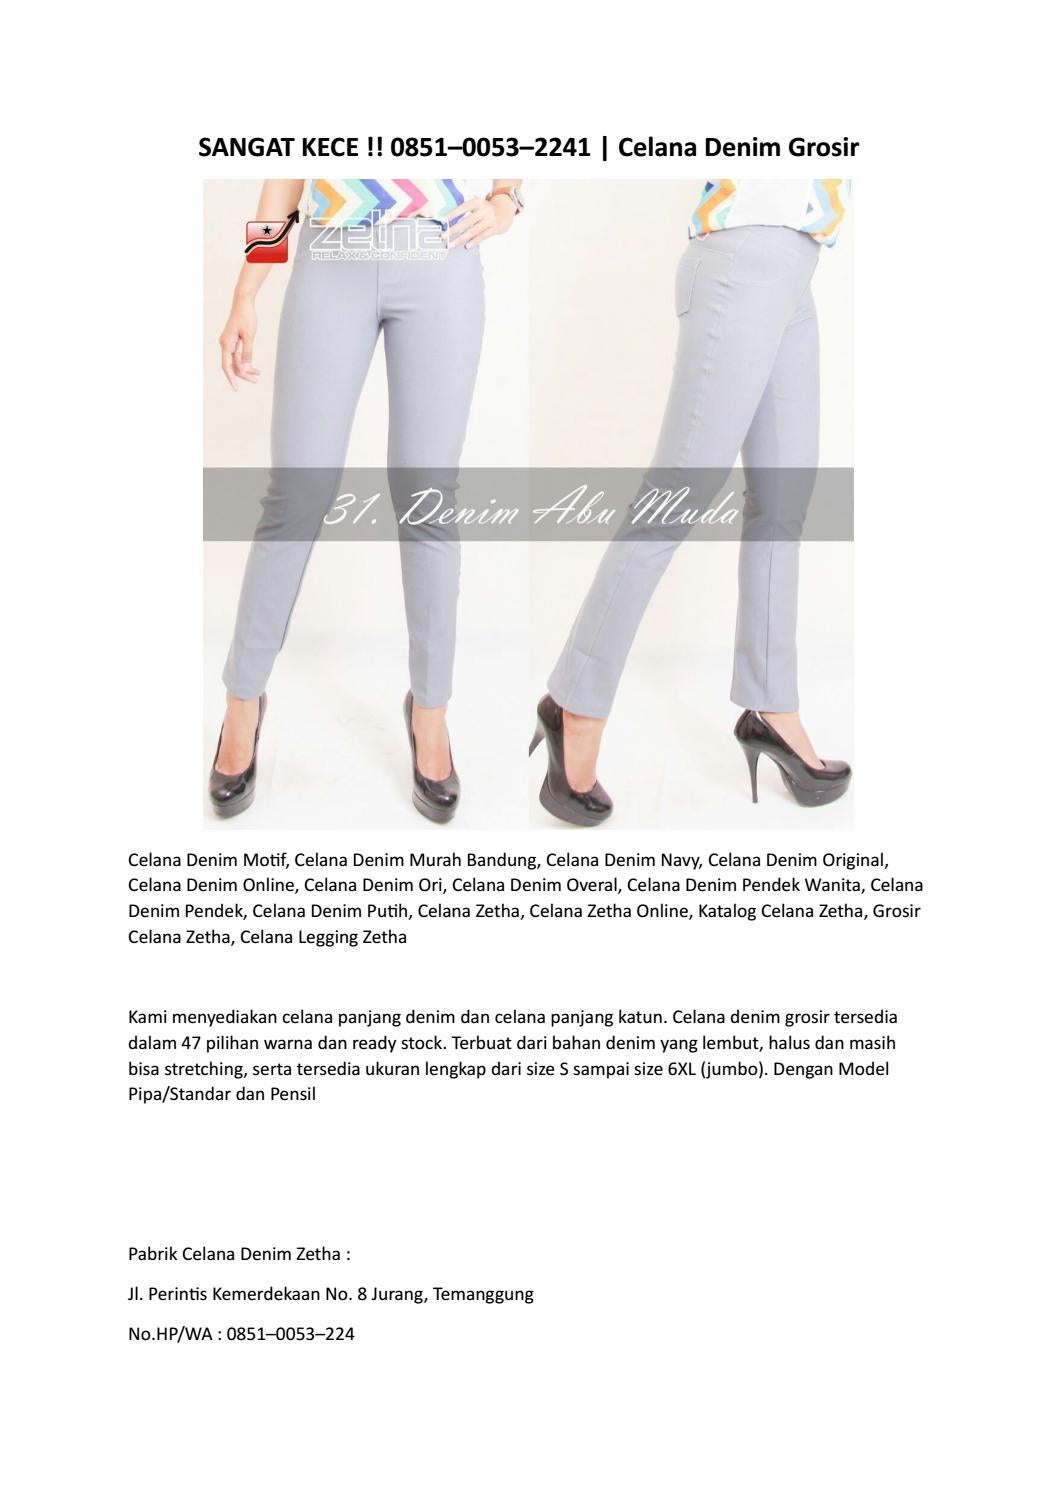 Sangat Kece 0851 0053 2241 Celana Denim Grosir By Distributor Celana Denim Wanita 0851 0053 2241 Issuu